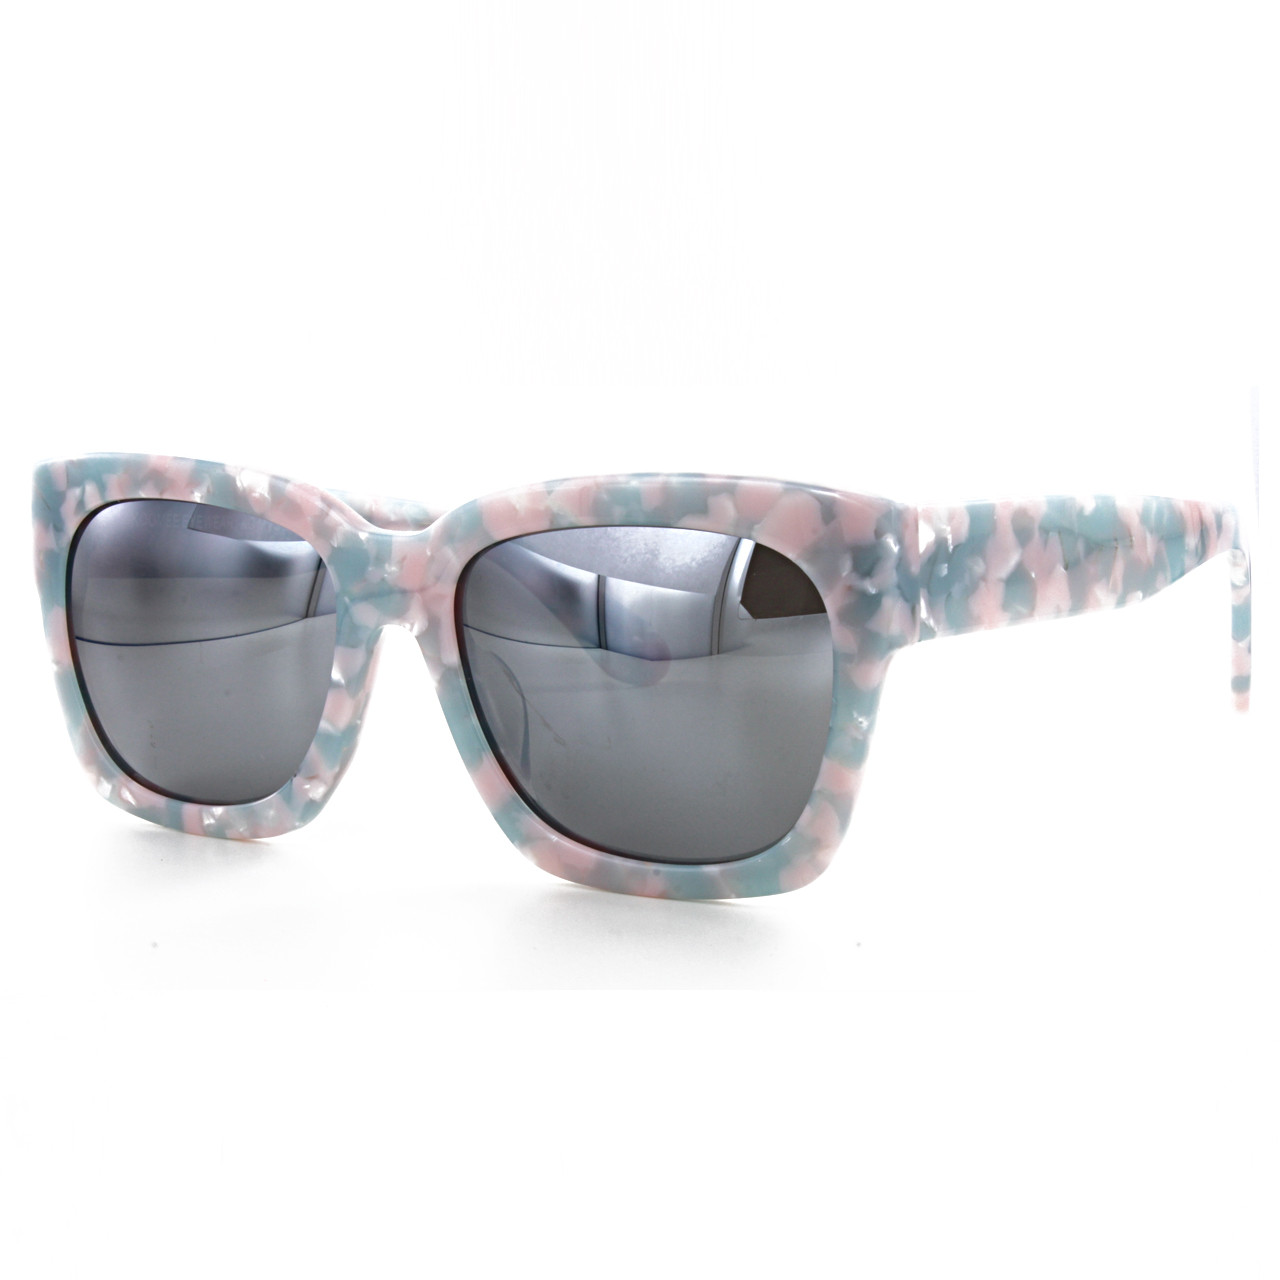 GEEK COUTURE Fashion Sunglasses Myself